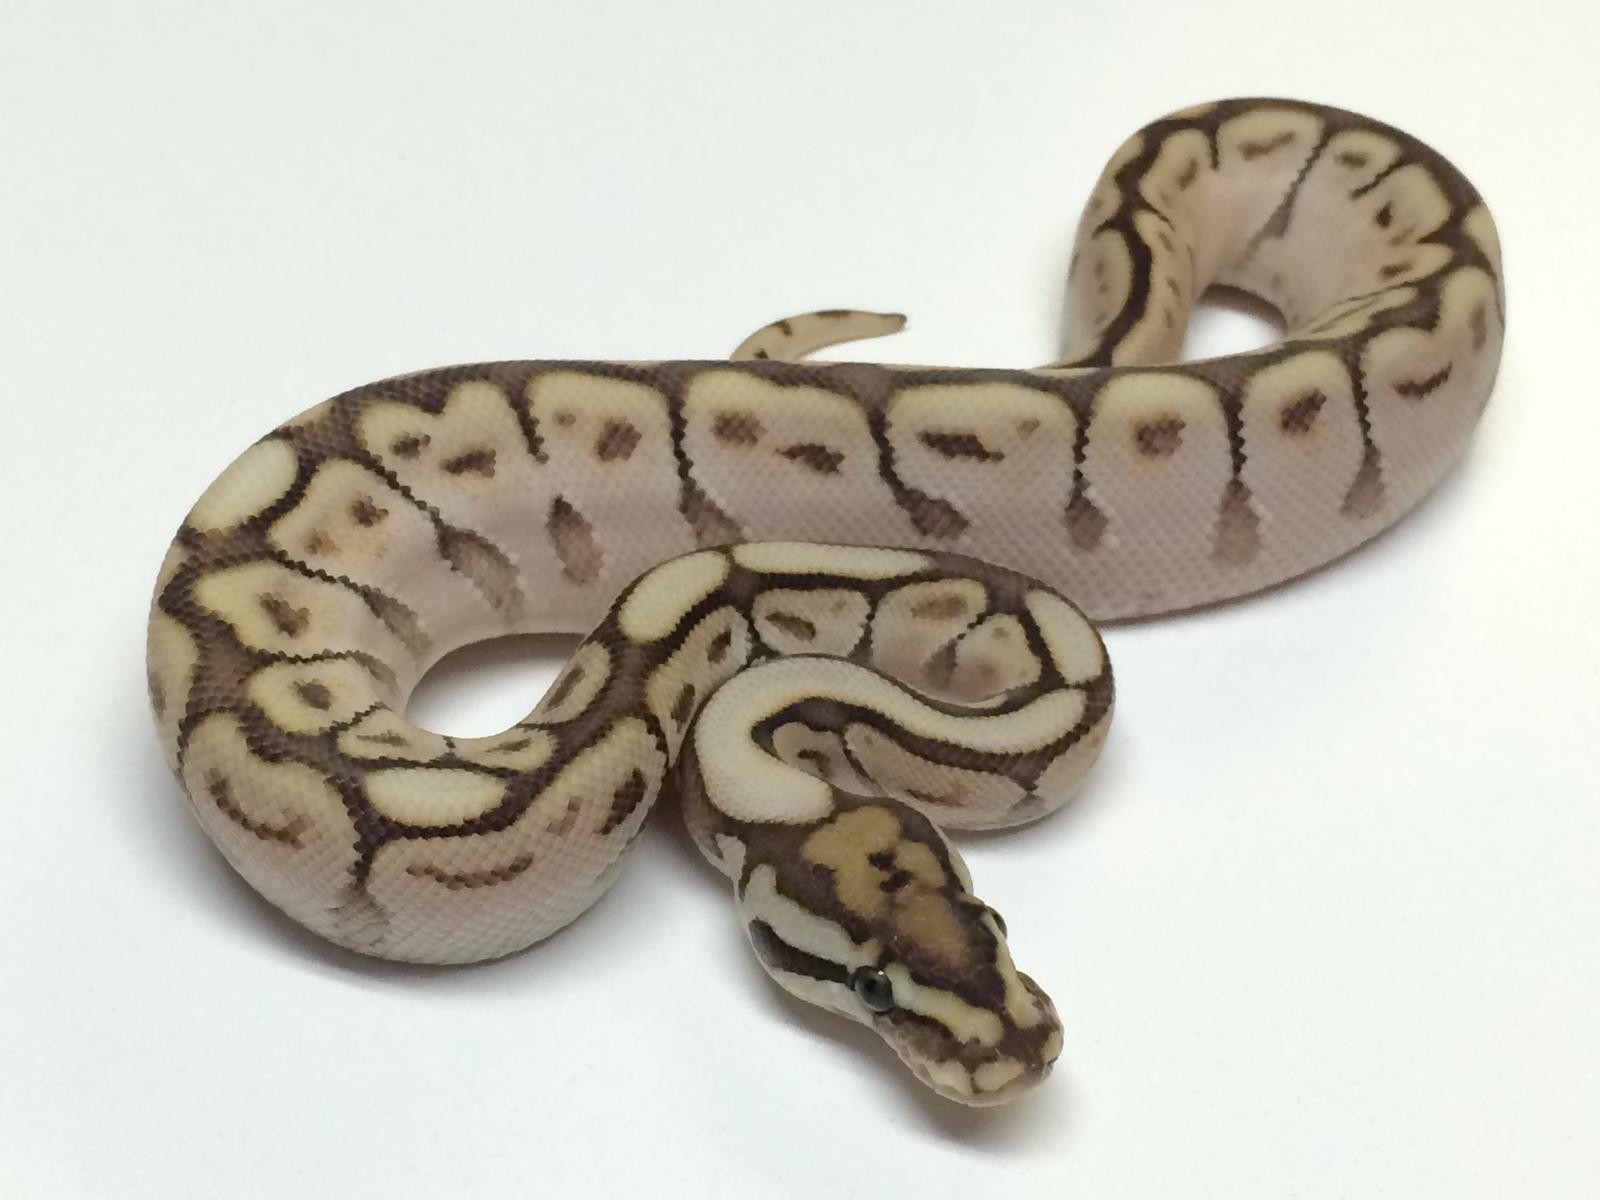 a spider ball python